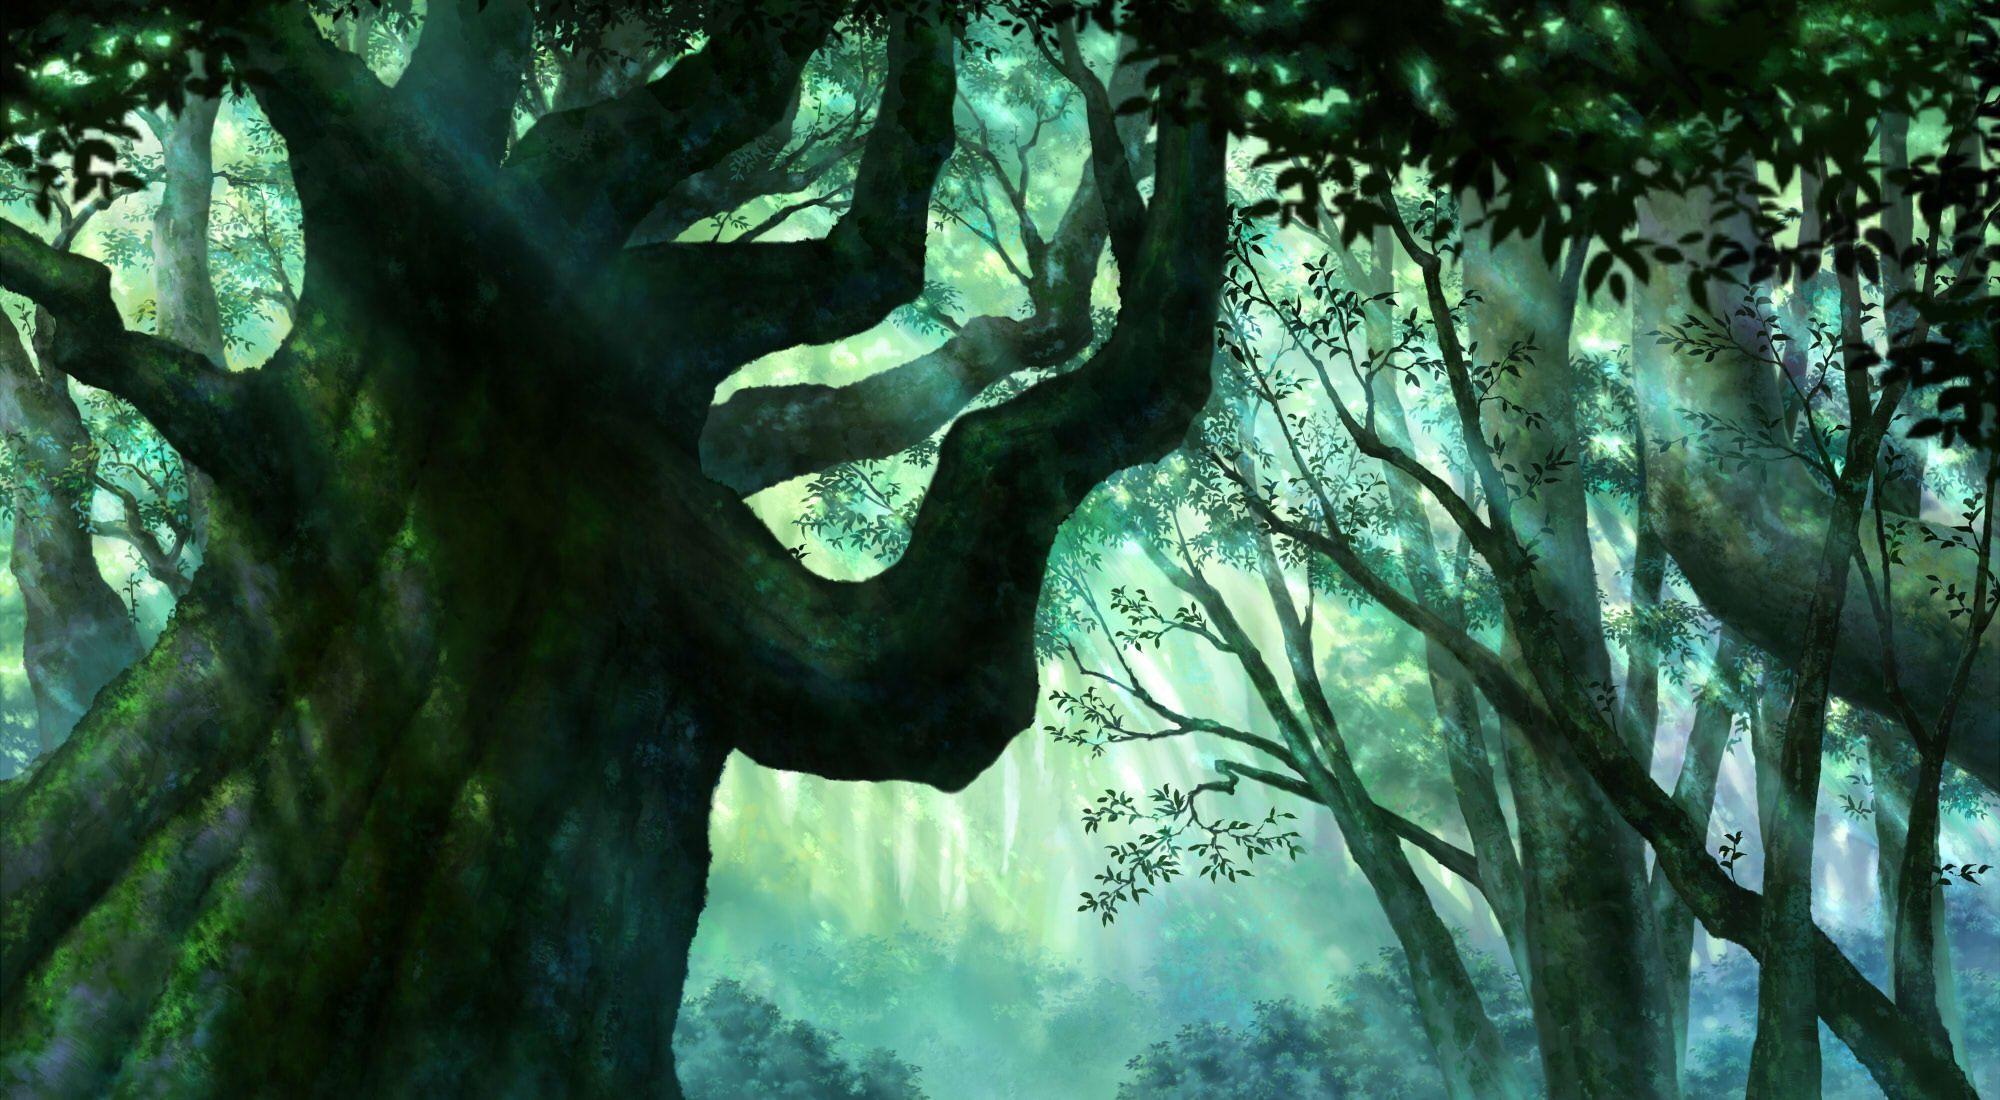 Sai 3d Wallpaper Anime Forest Backgrounds Wallpaper Cave